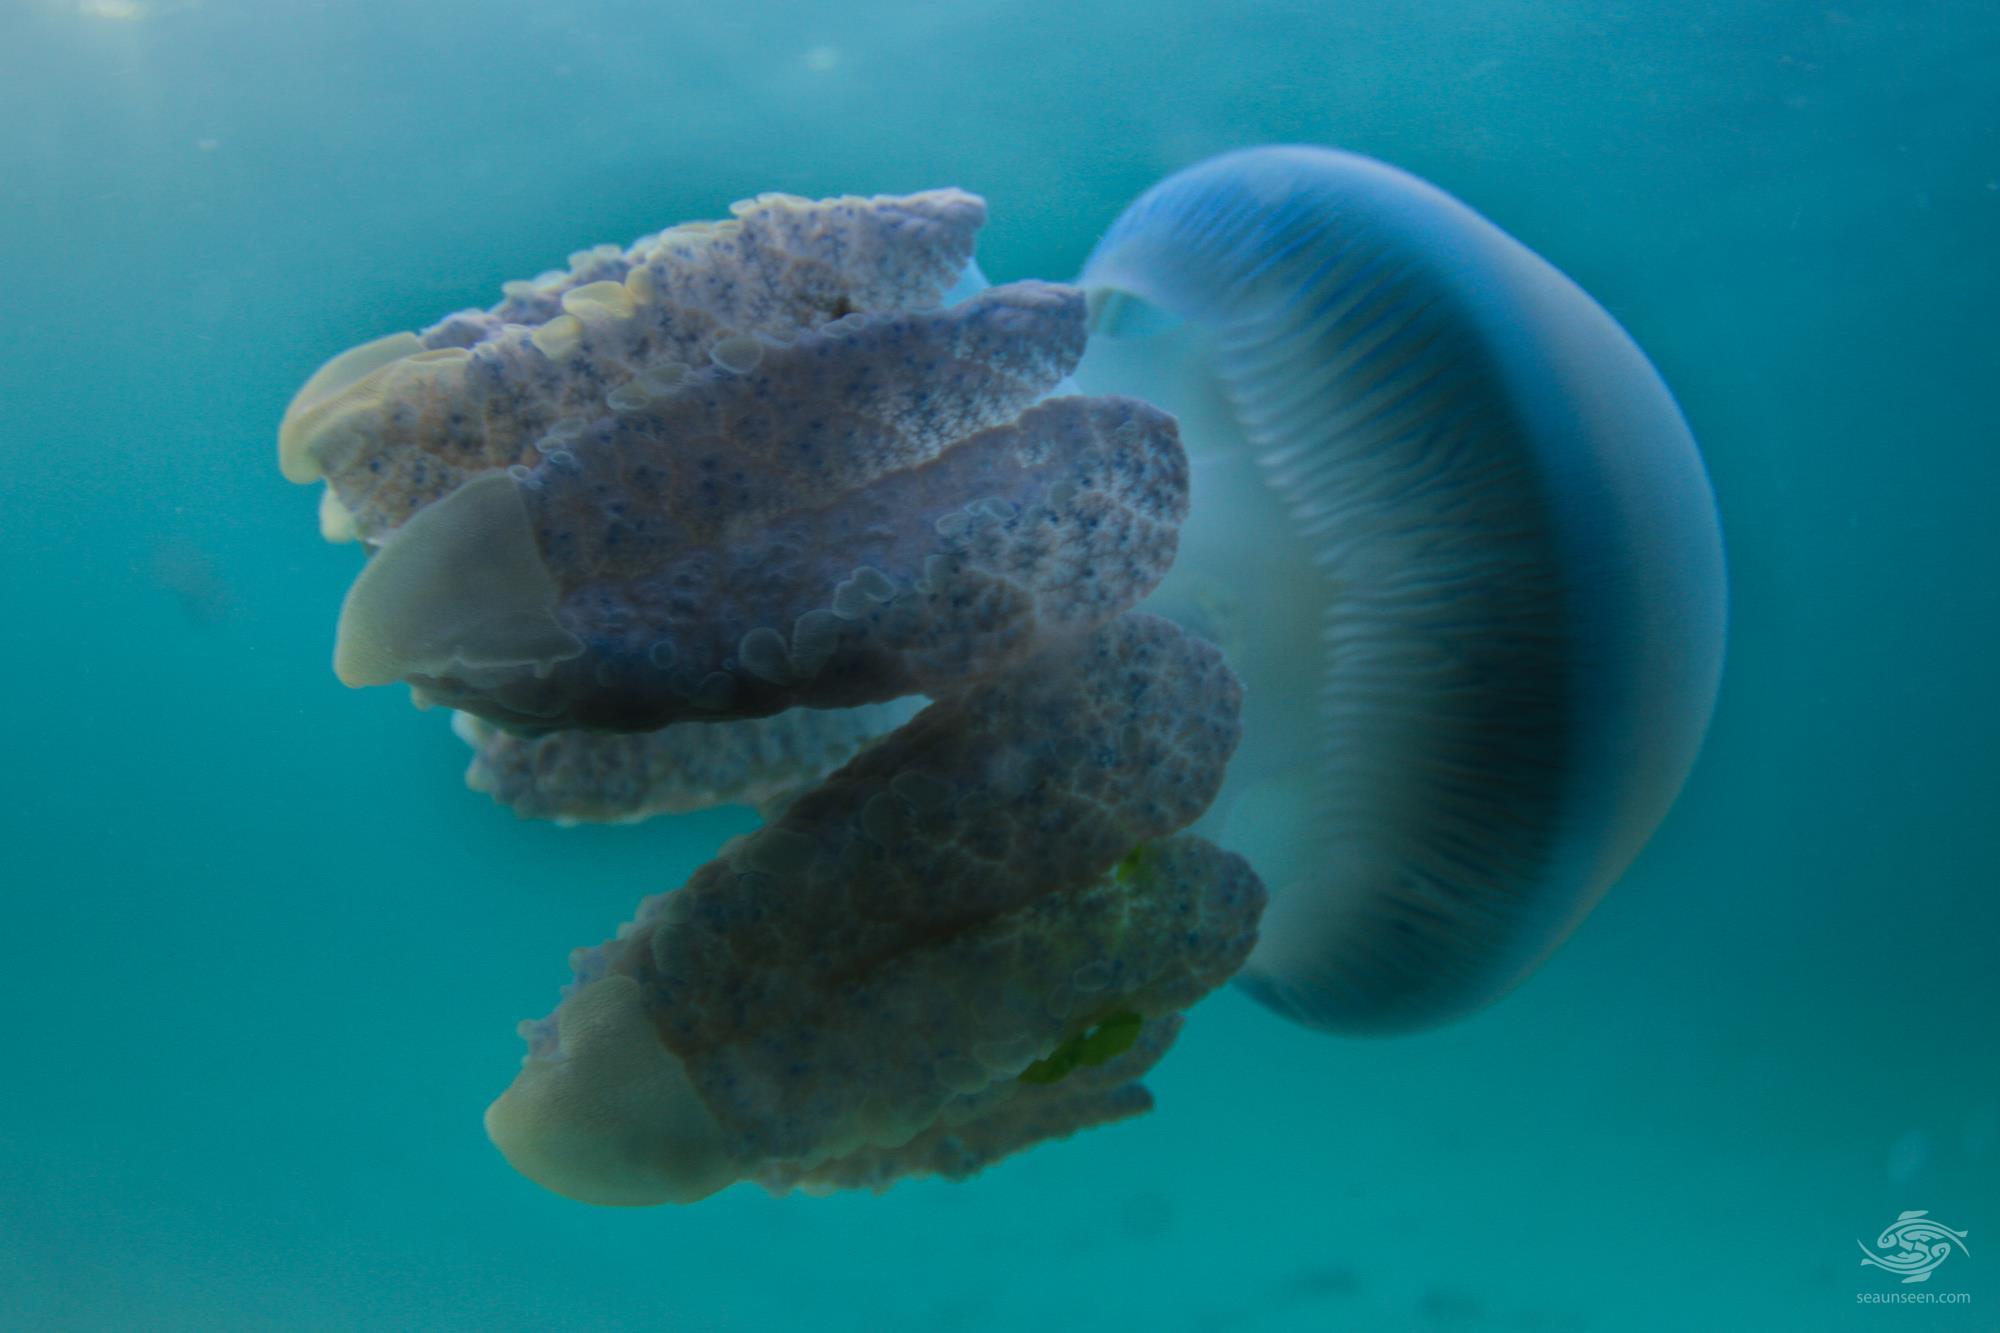 blue blubber jellyfish (Catostylus mosaicus)